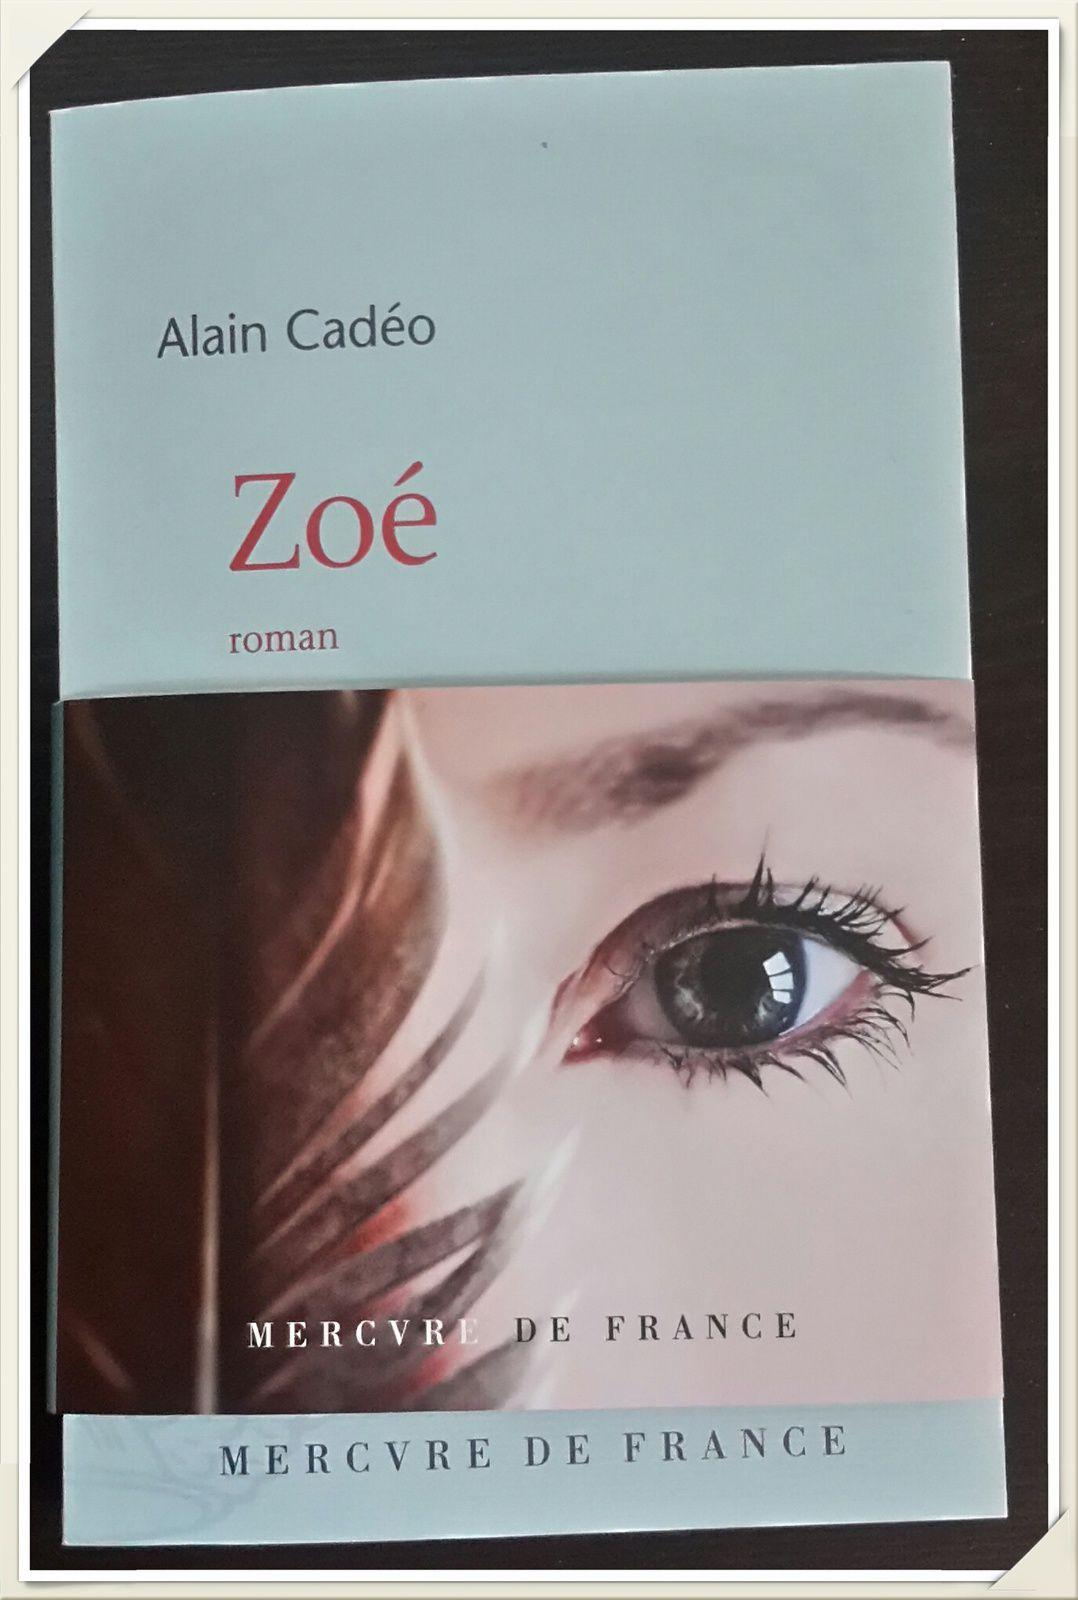 Zoé - Alain Cadéo